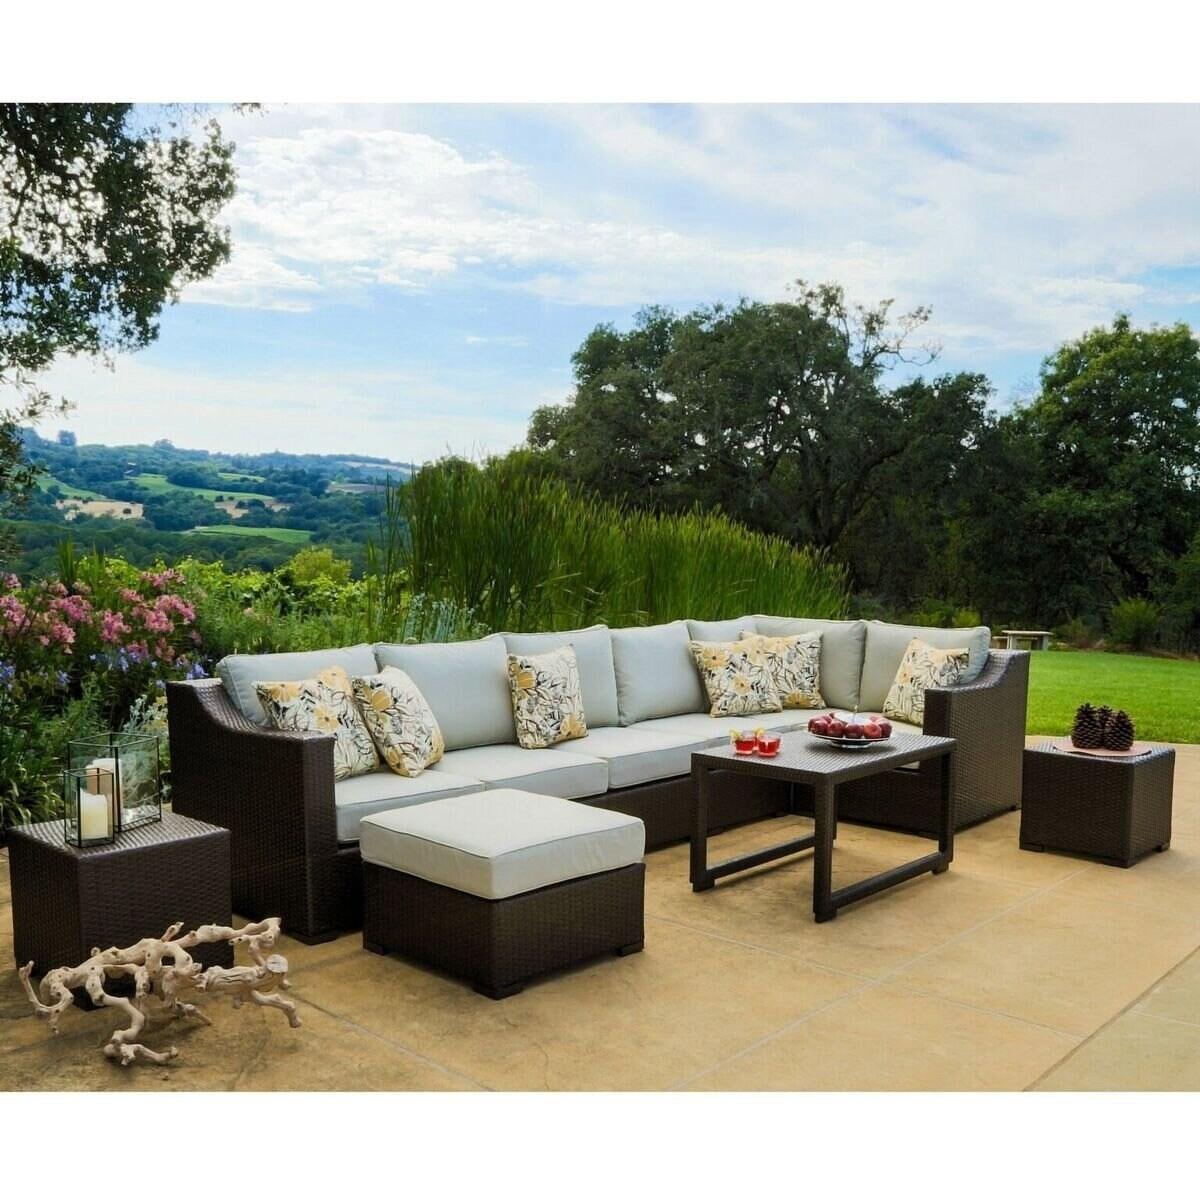 Shop Black Friday Deals On Matura 10 Piece Dark Brown Wicker Patio Furniture Set By Corvus Overstock 9034172